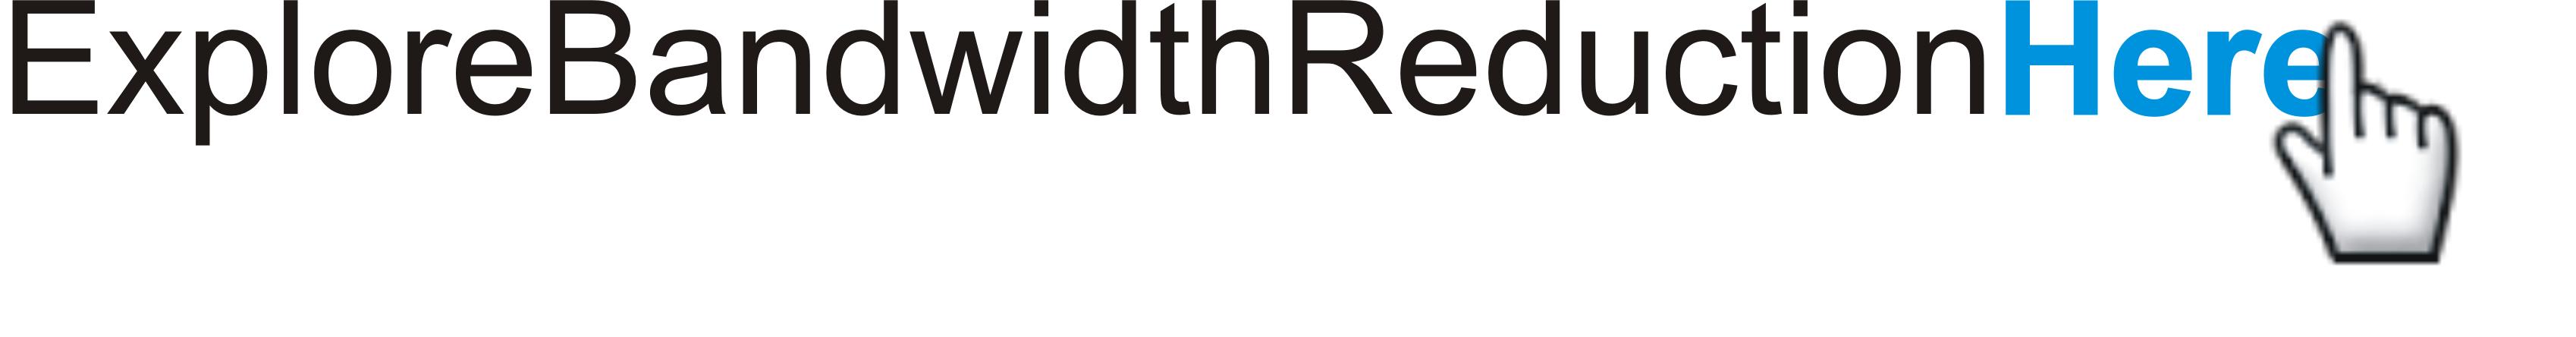 ExploreBandwidthReductionHere_button